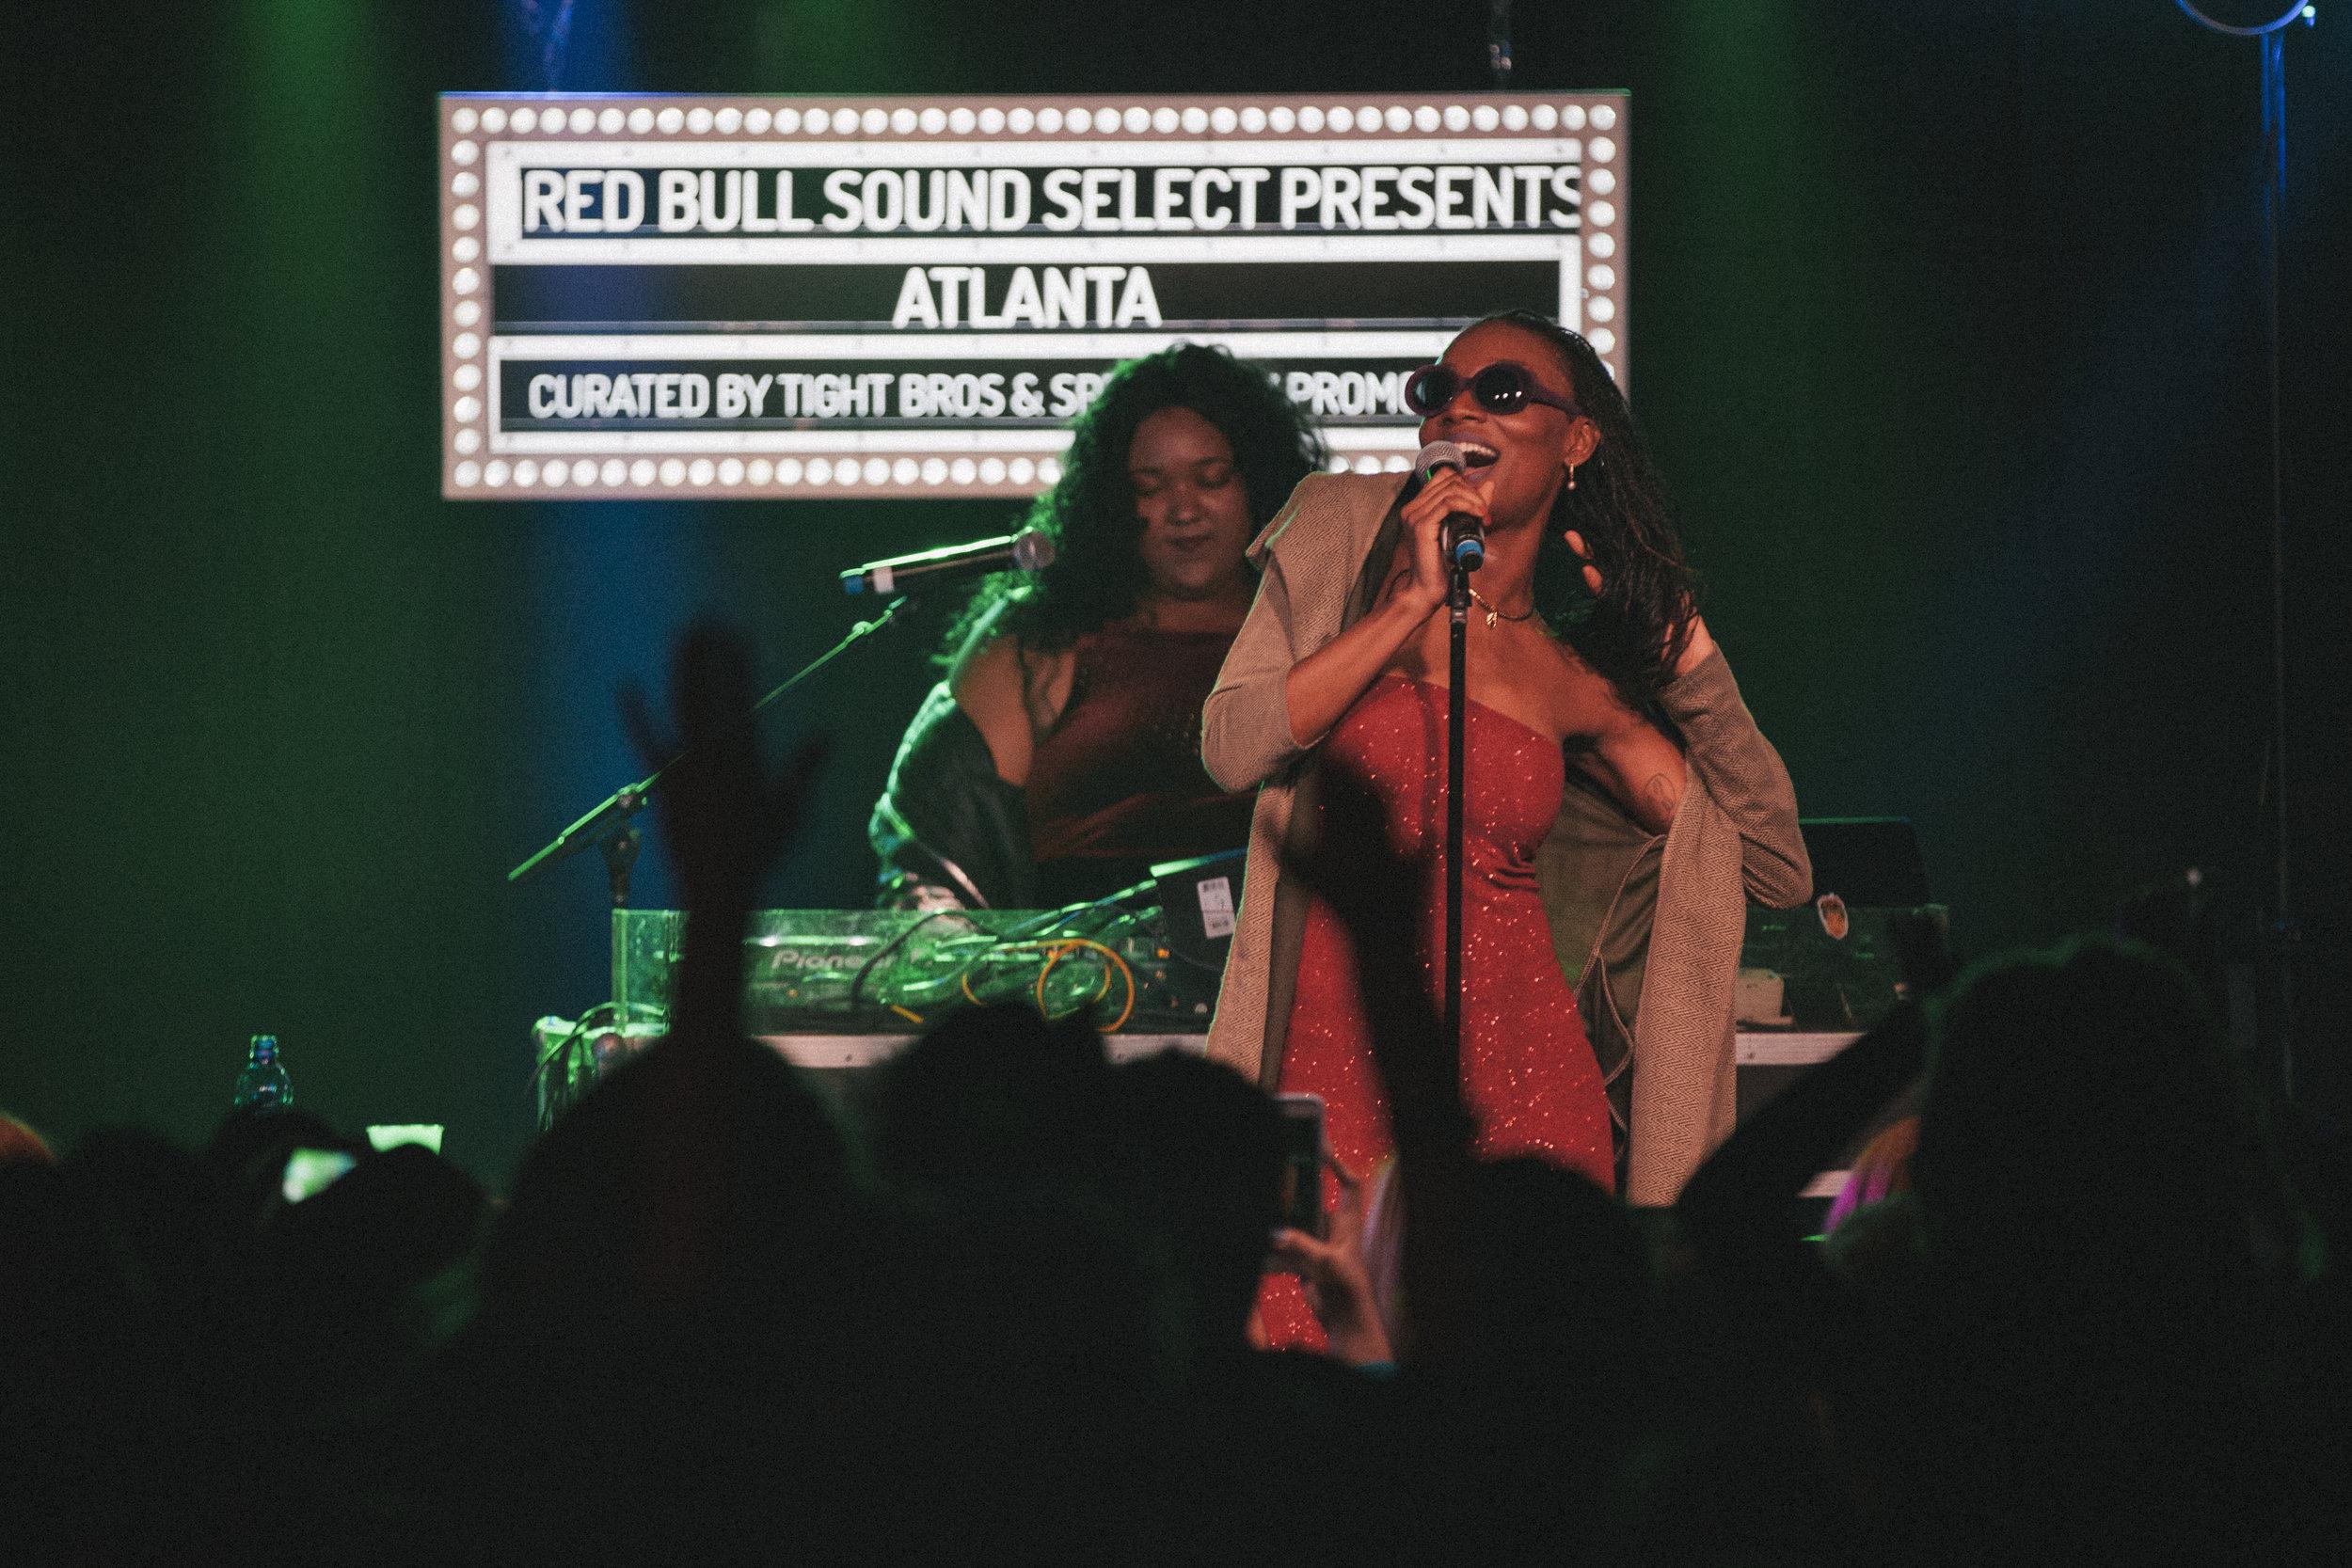 FJ_171201_Sound_Selects_Presents_Atlanta-20.jpg